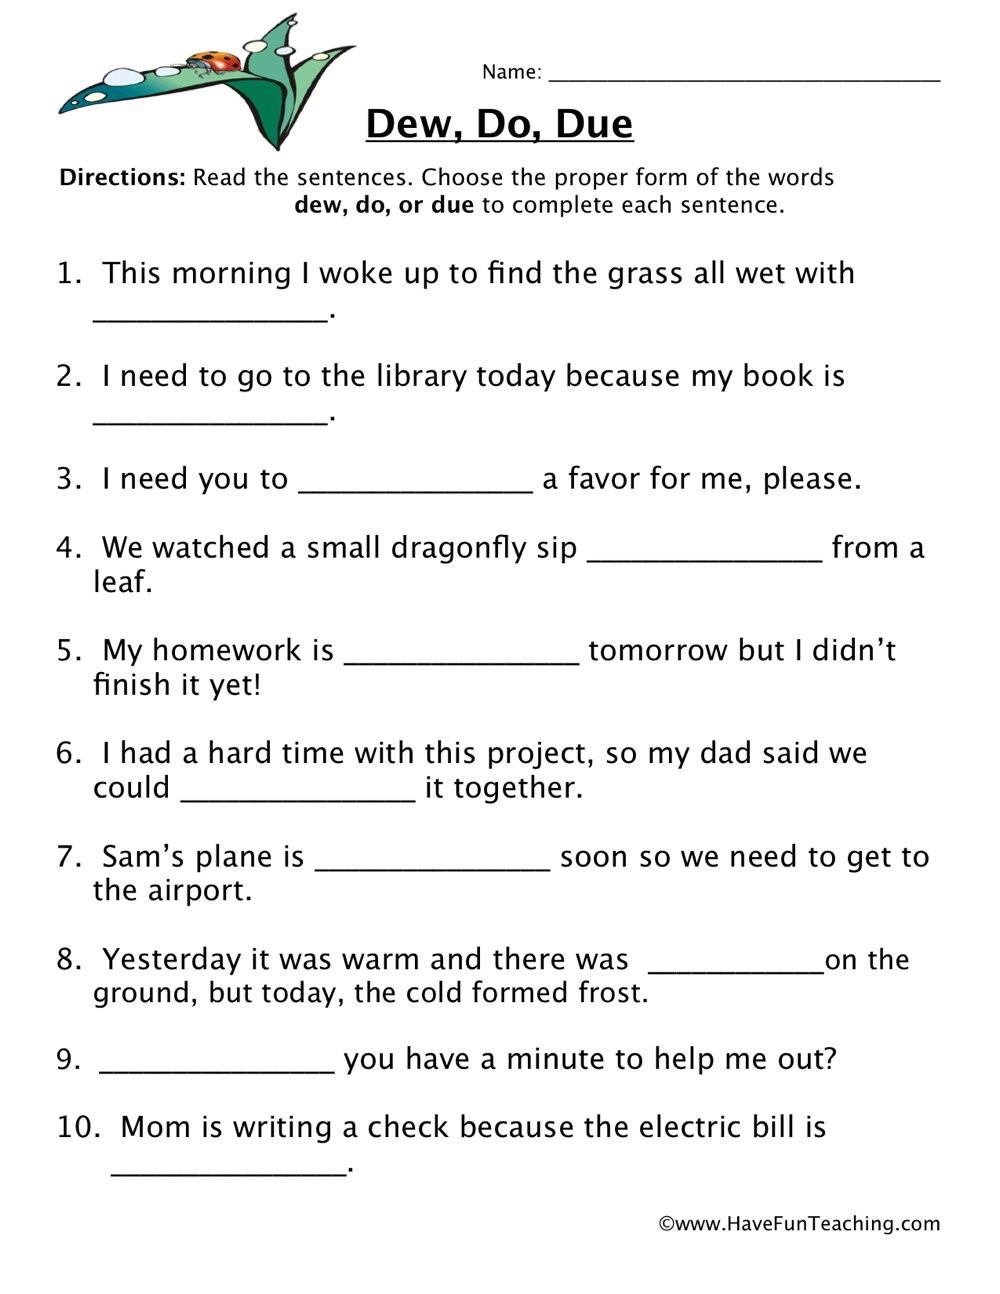 Homophones Worksheet 5th Grade Dew Do Due Homophones Worksheet